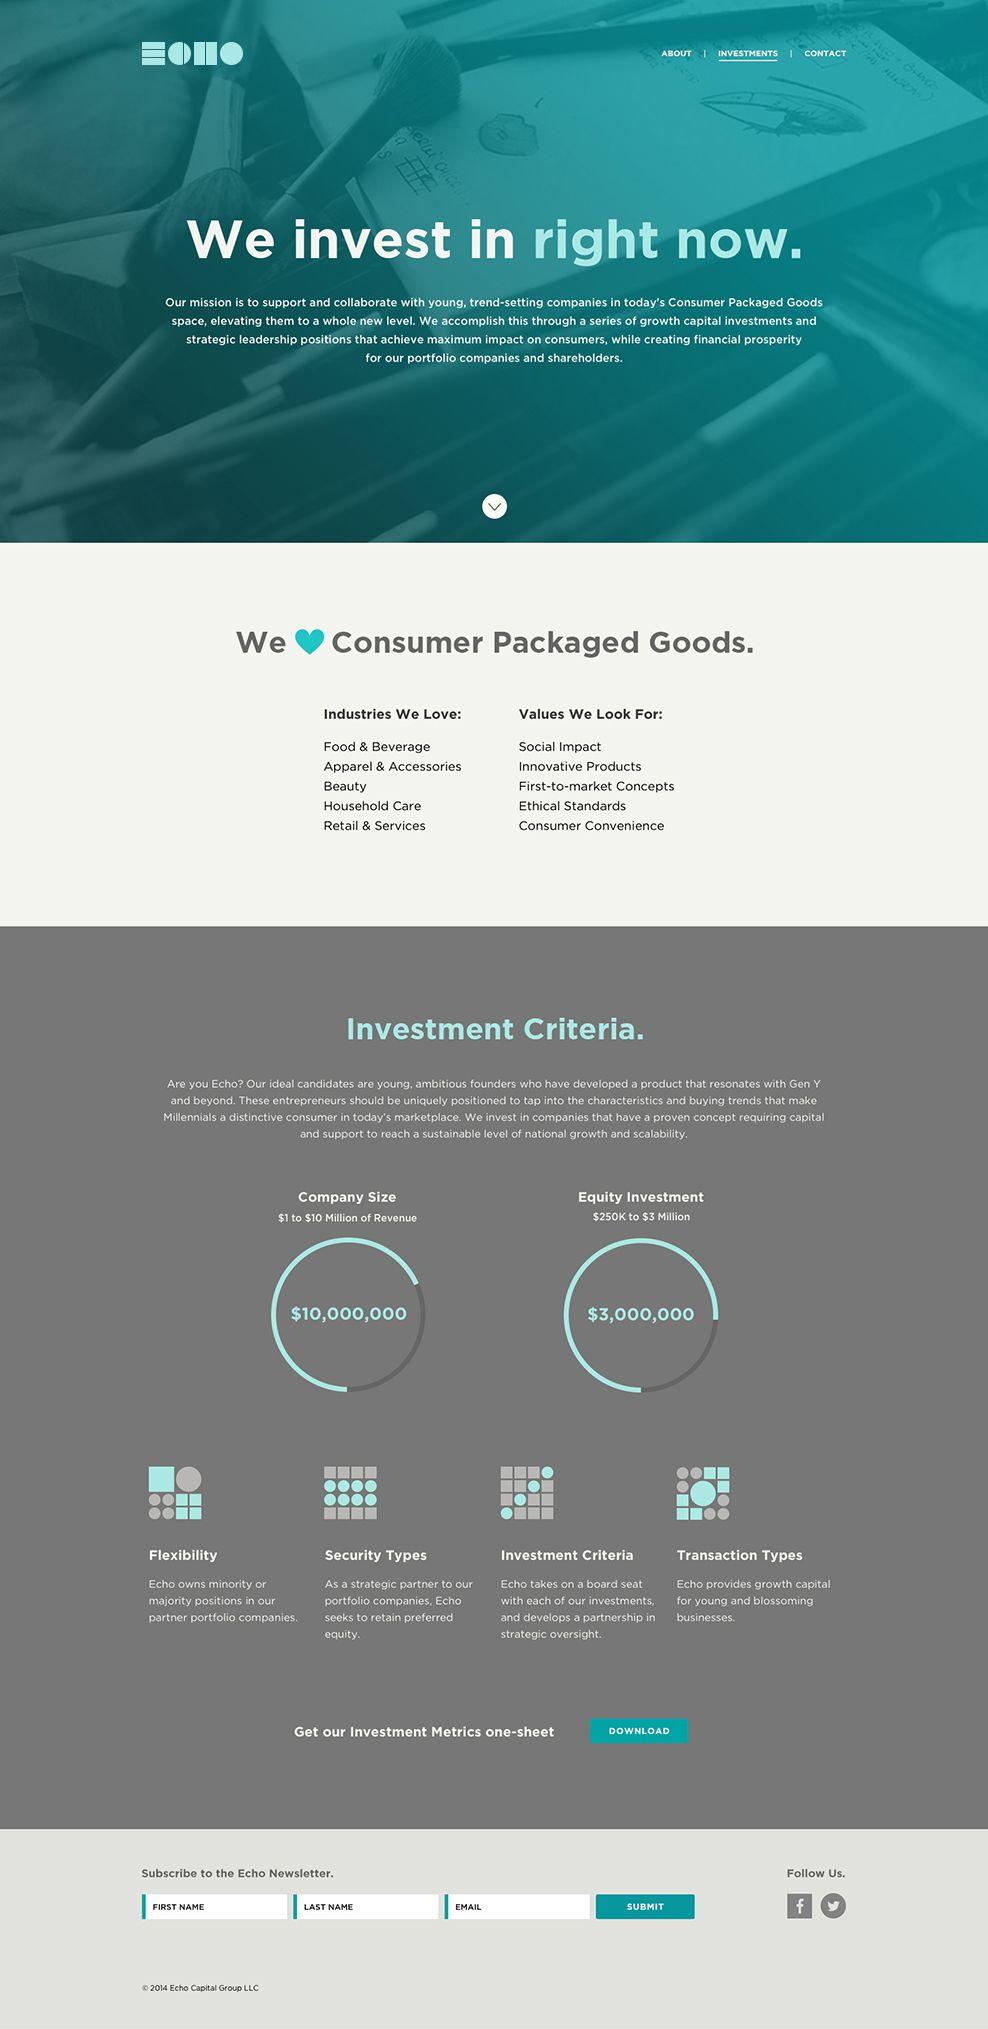 Truf Echo Capital Investments 2 Beautiful Web Design Web Layout Design Website Design